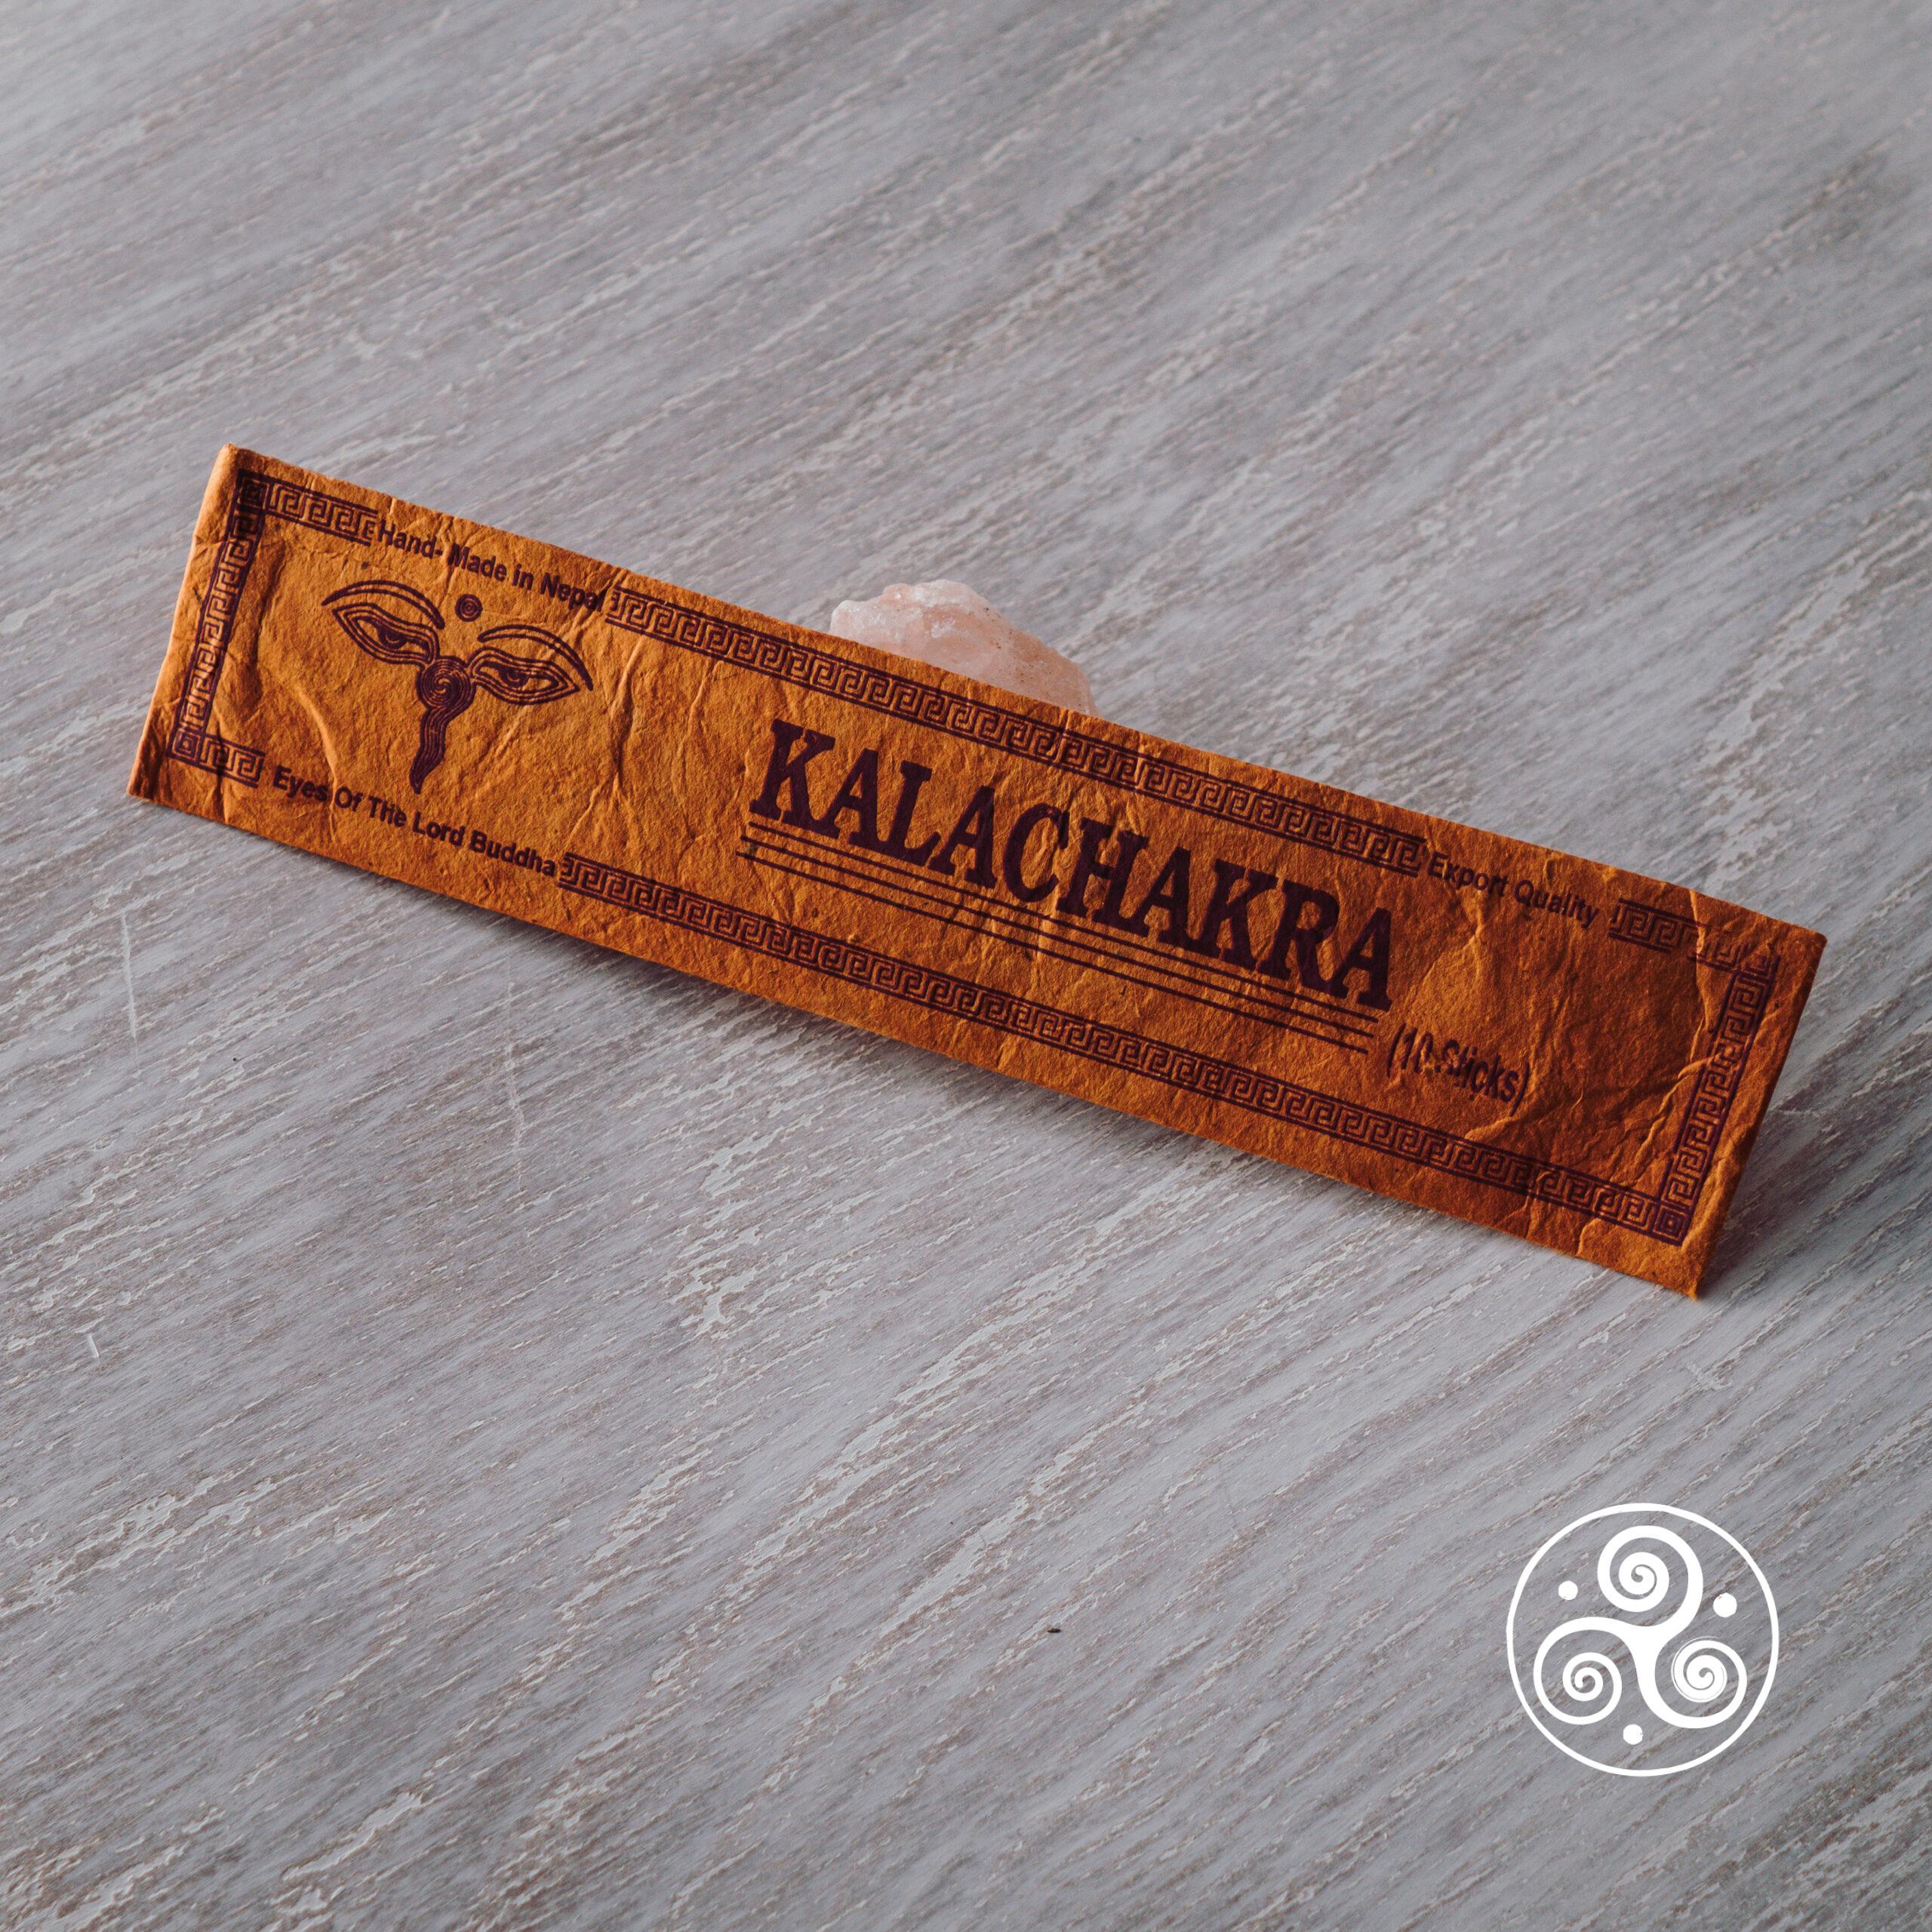 Nepali Lakta Incense Sticks - Kalachakra